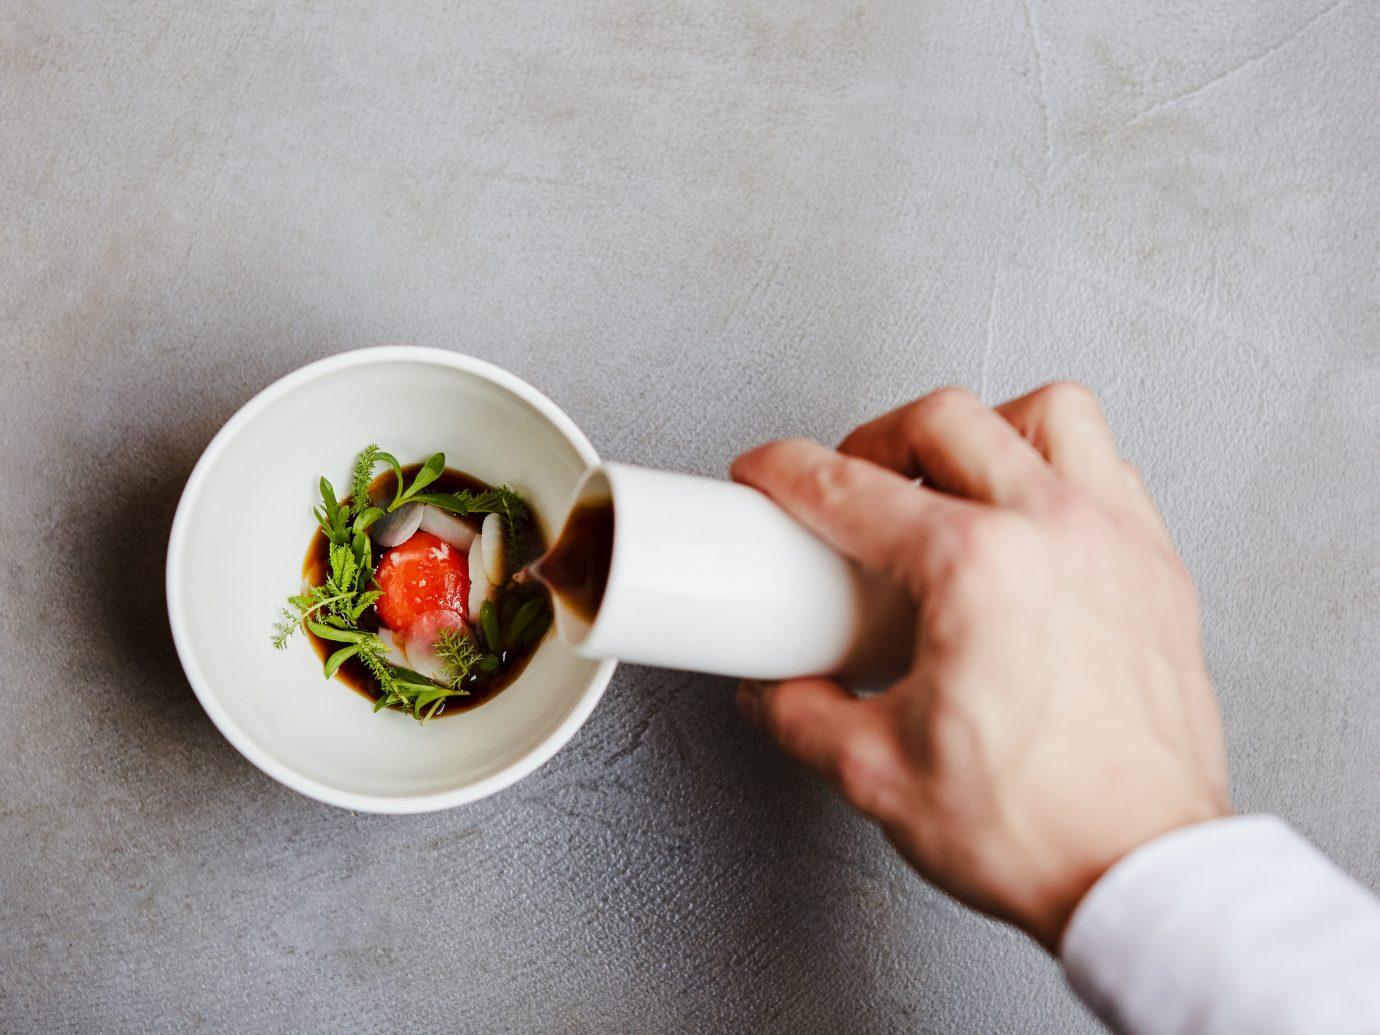 Food + Drink London person indoor tableware food dish dishware cutlery plate recipe hand bowl